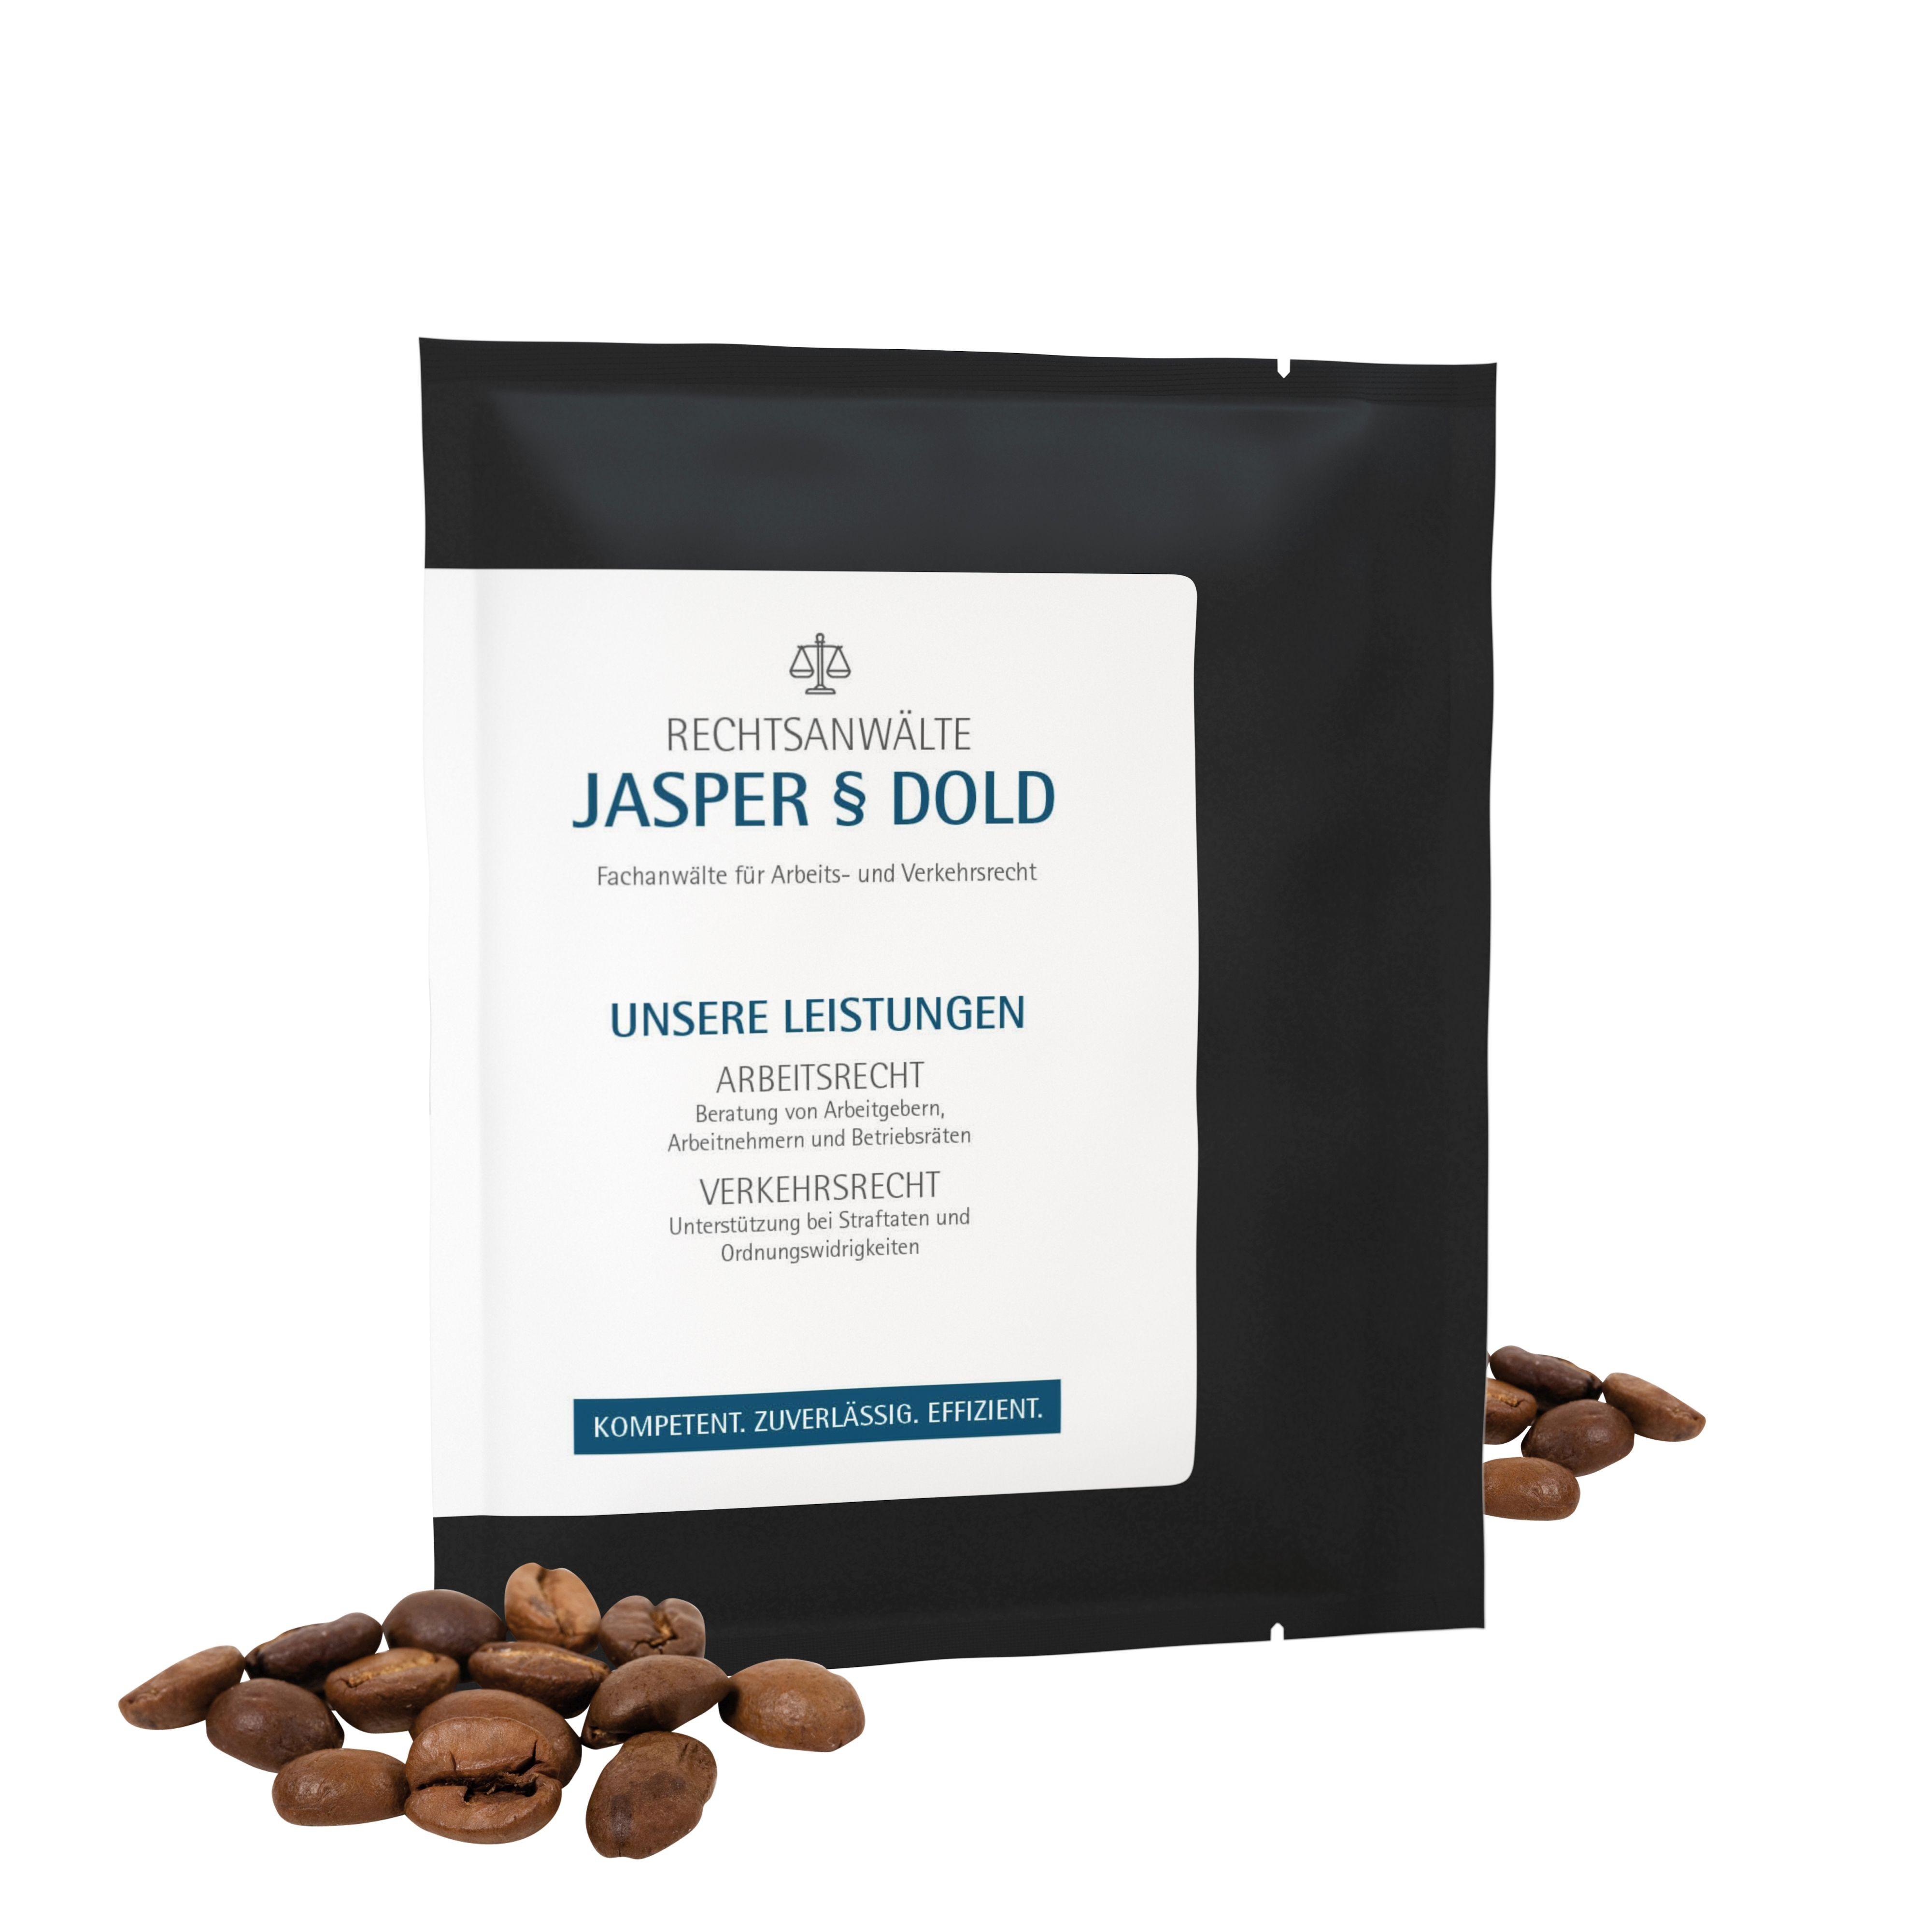 CoffeeBag - Bio Sipisopiso (mild) - Individueel Design, zwart